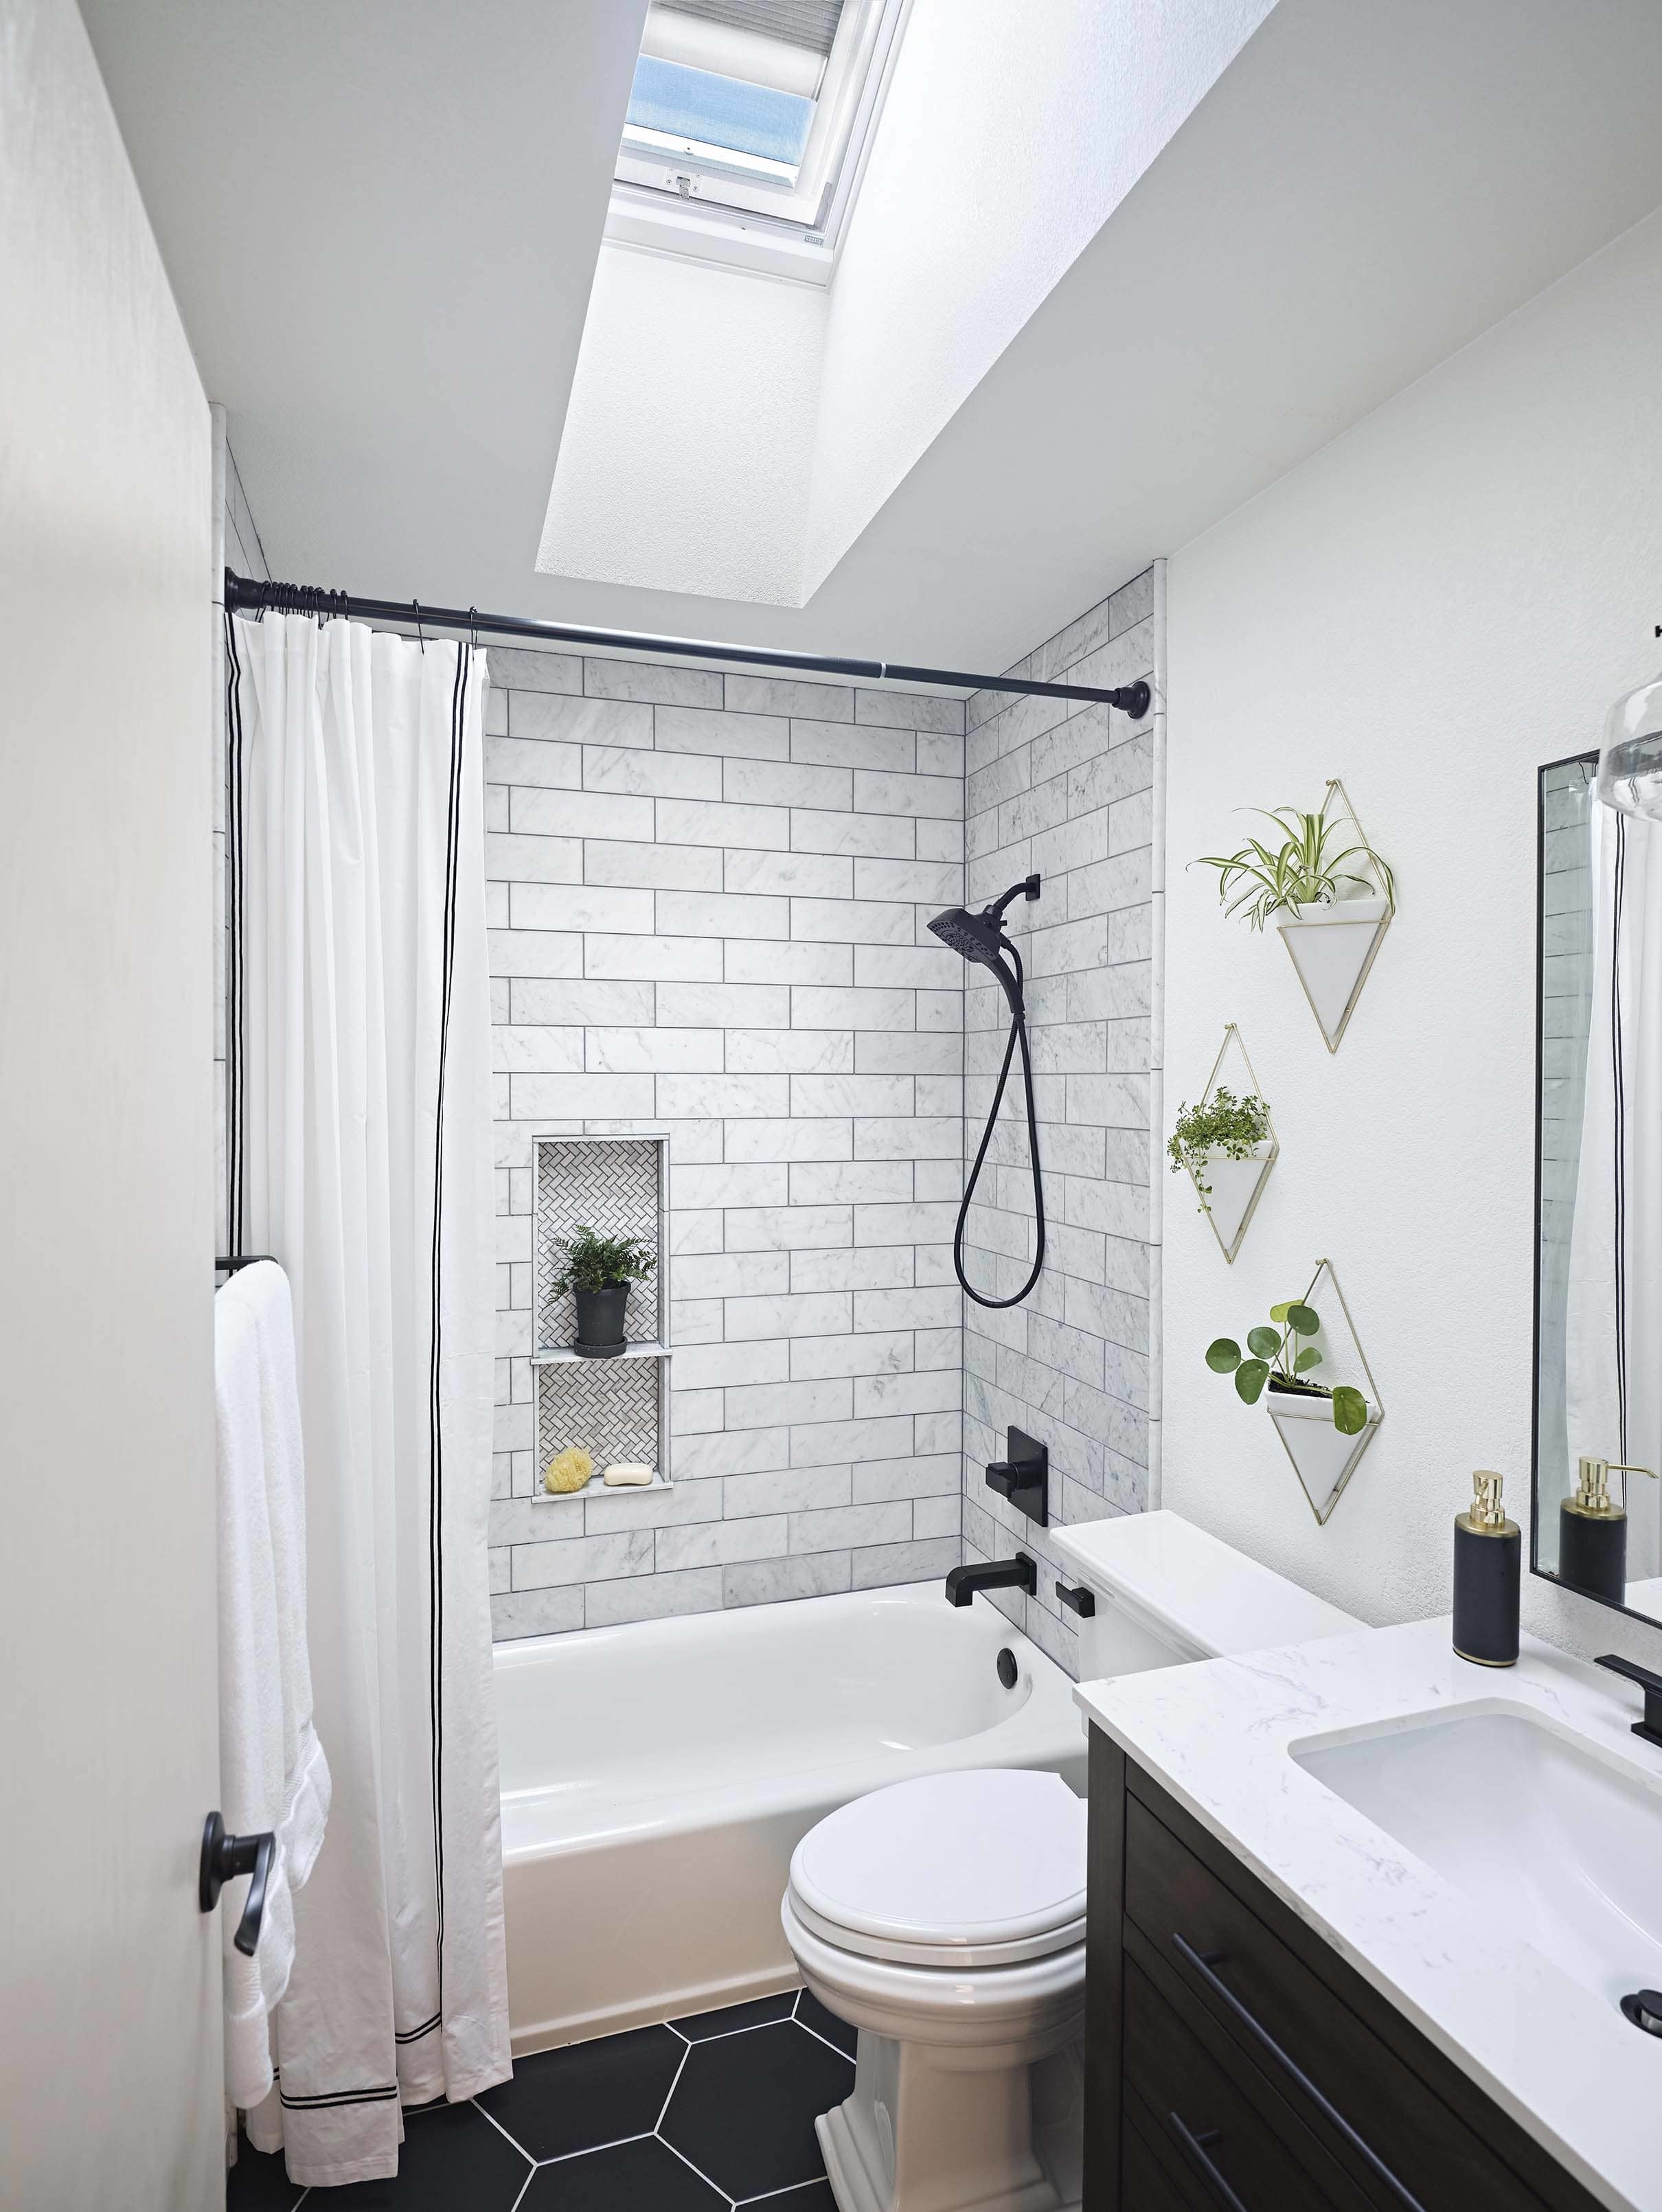 Bathroom black white skylight plants